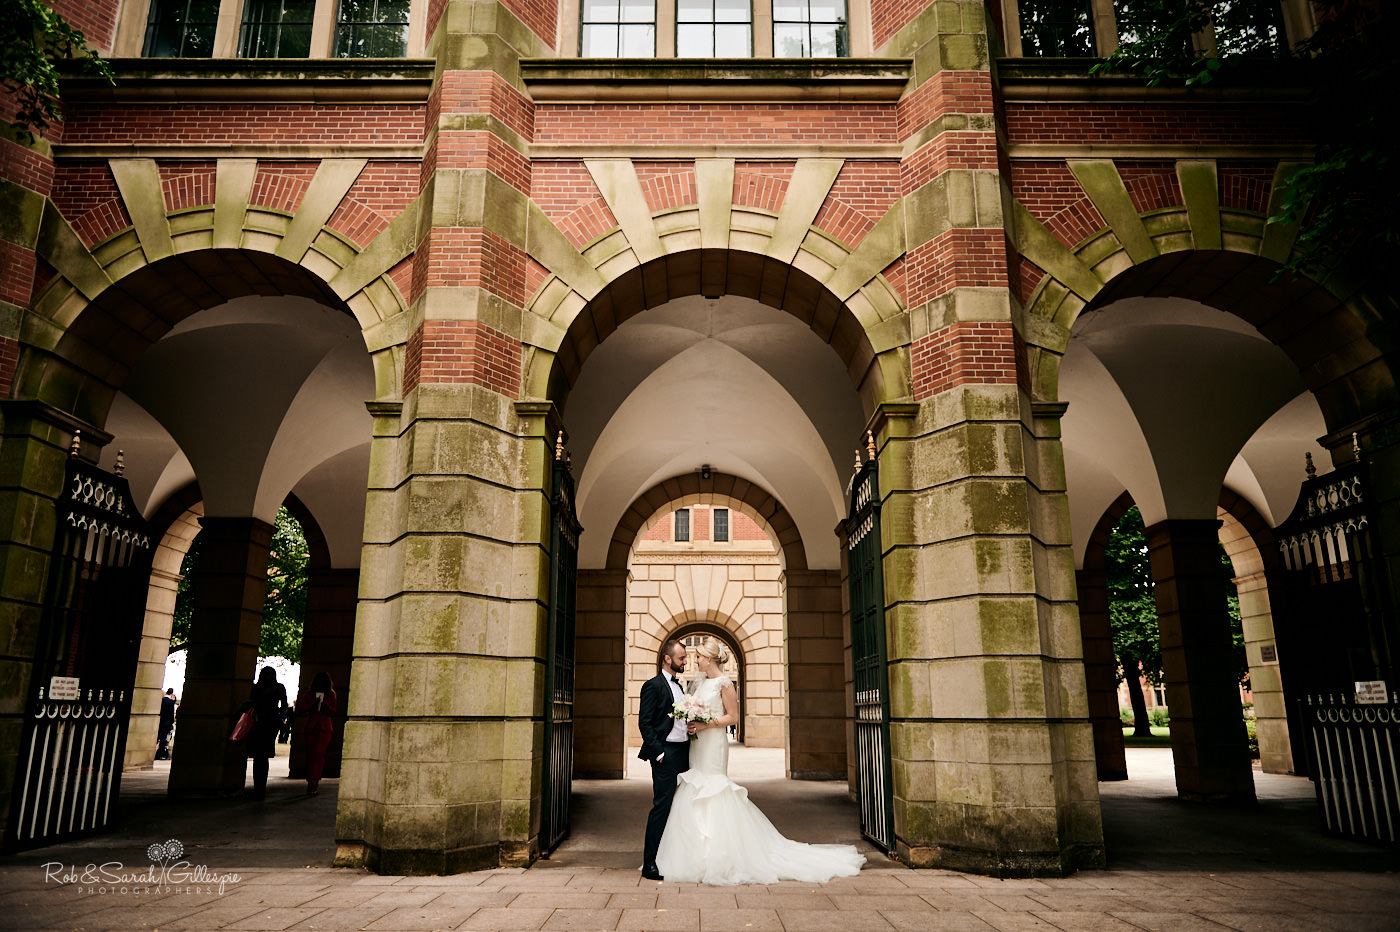 Bride and groom wedding photos at Birmingham University